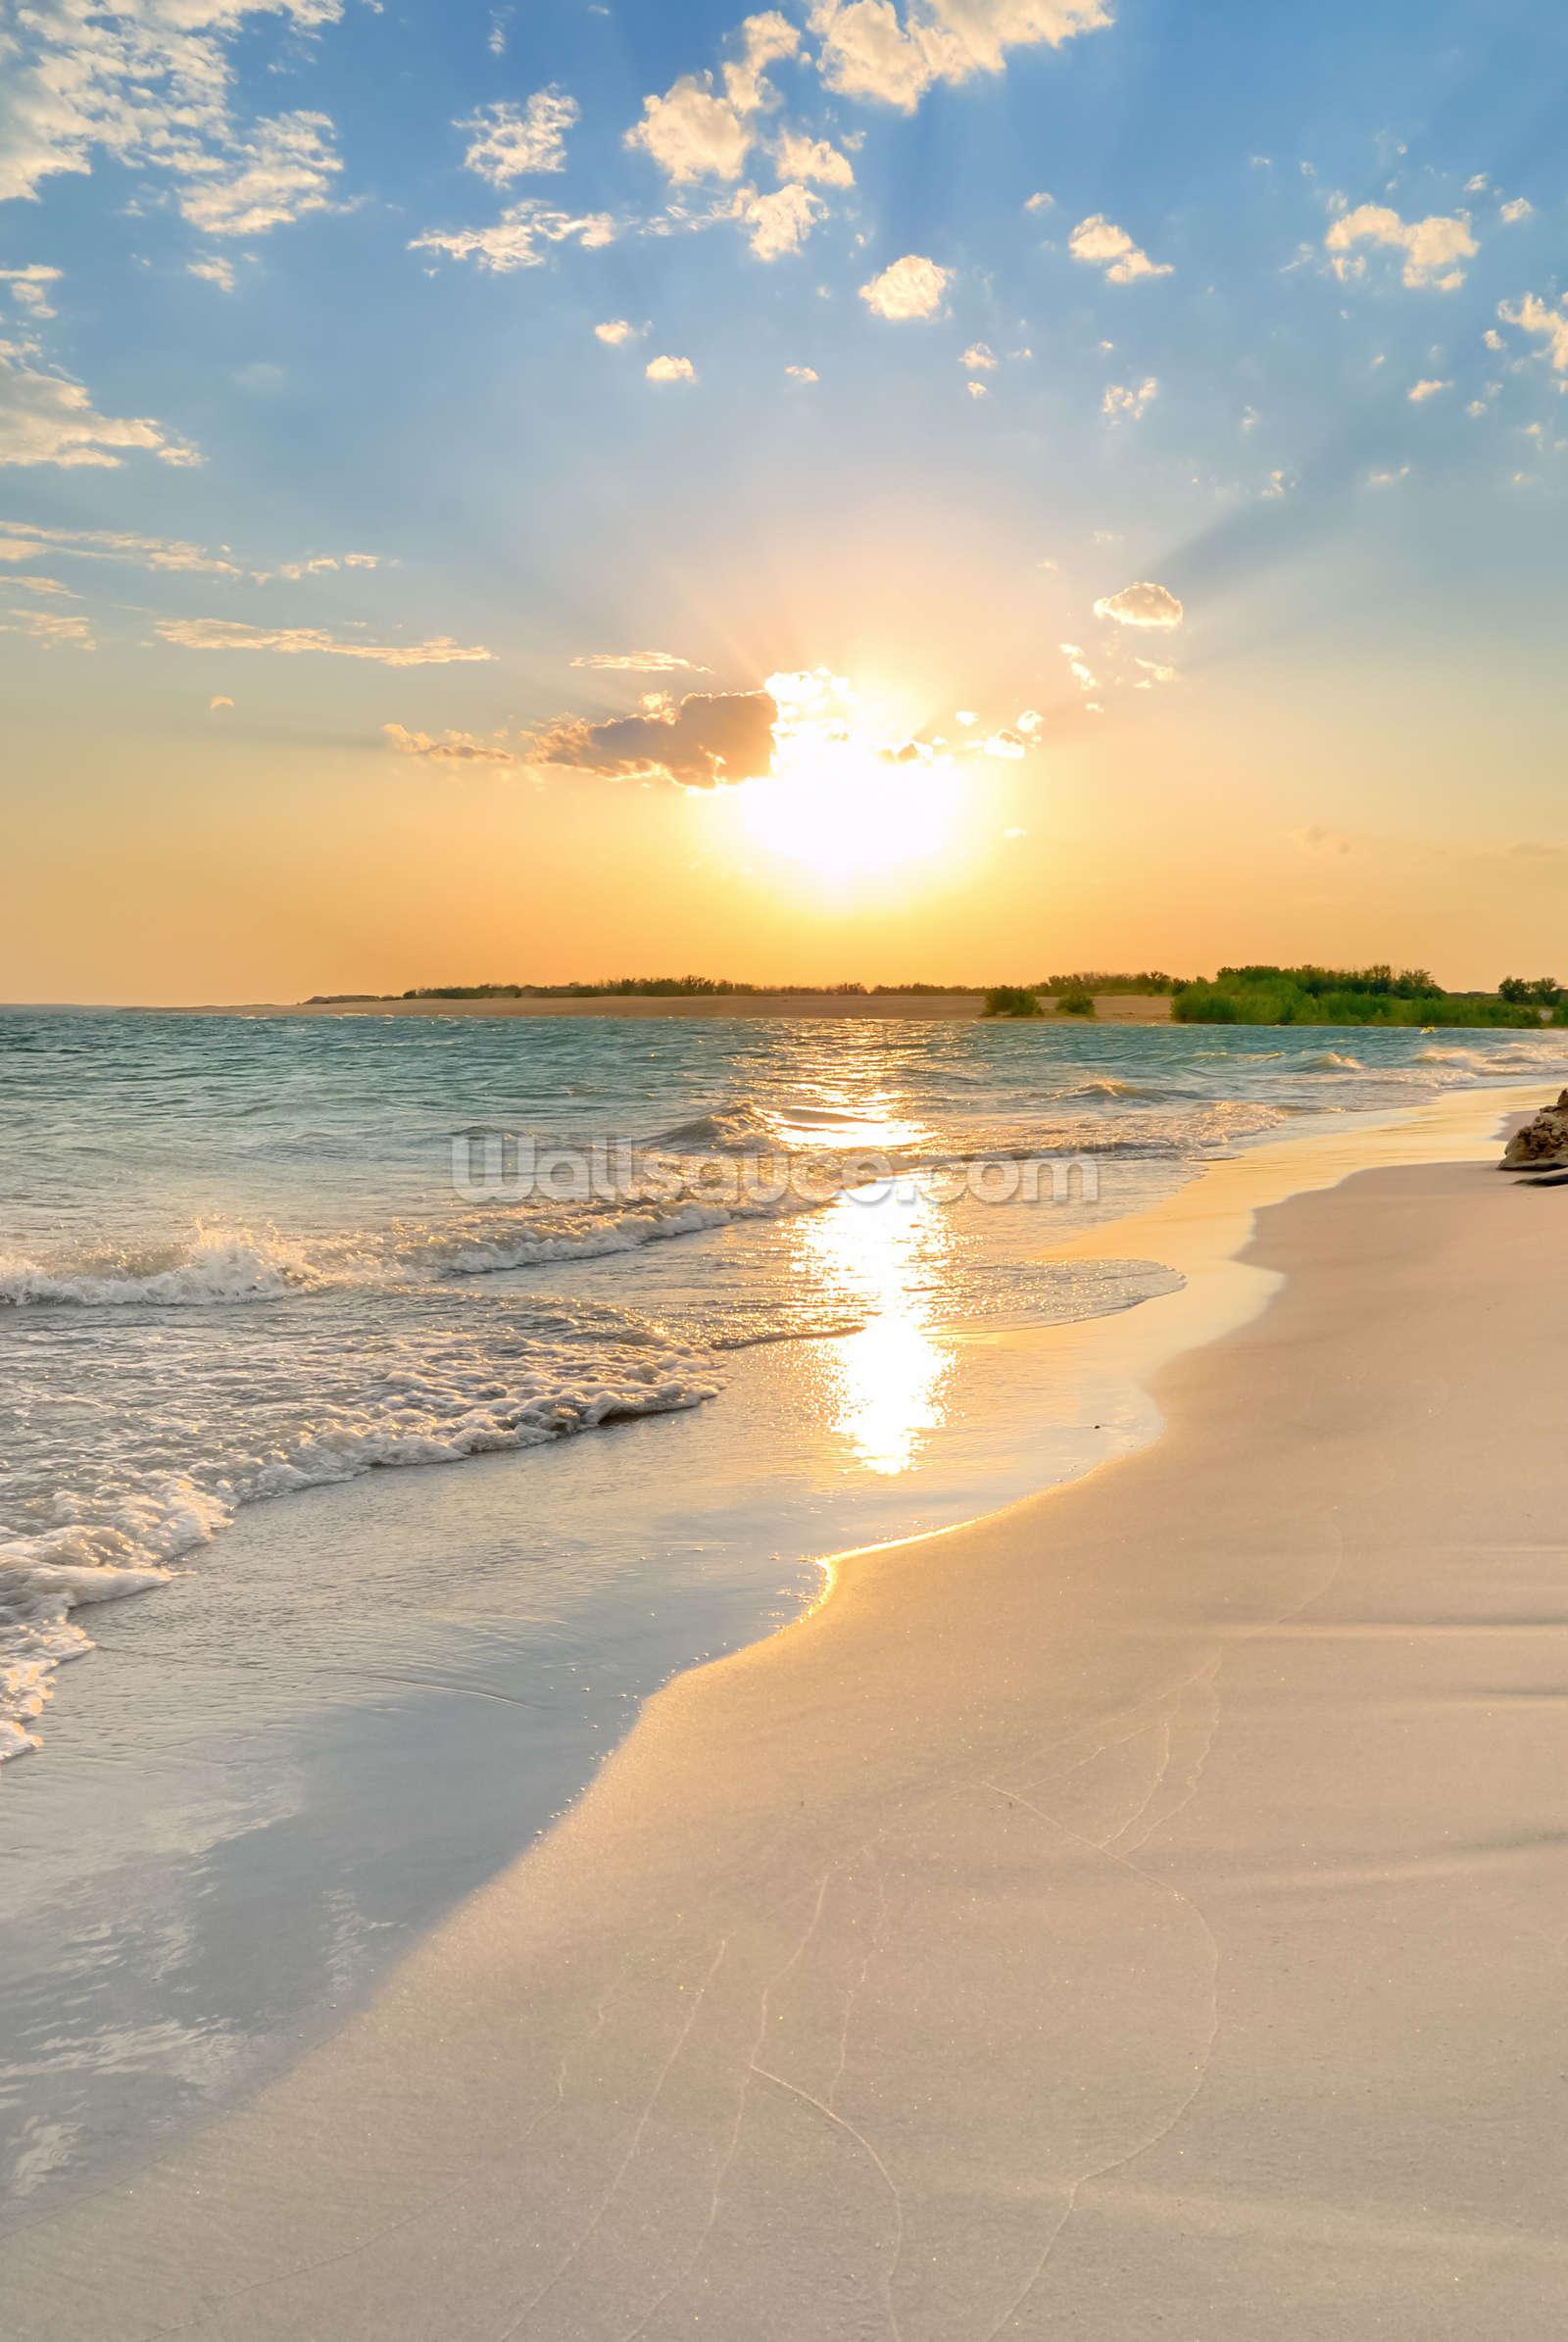 free photo beach sunset sun summer sunset free download jooinn